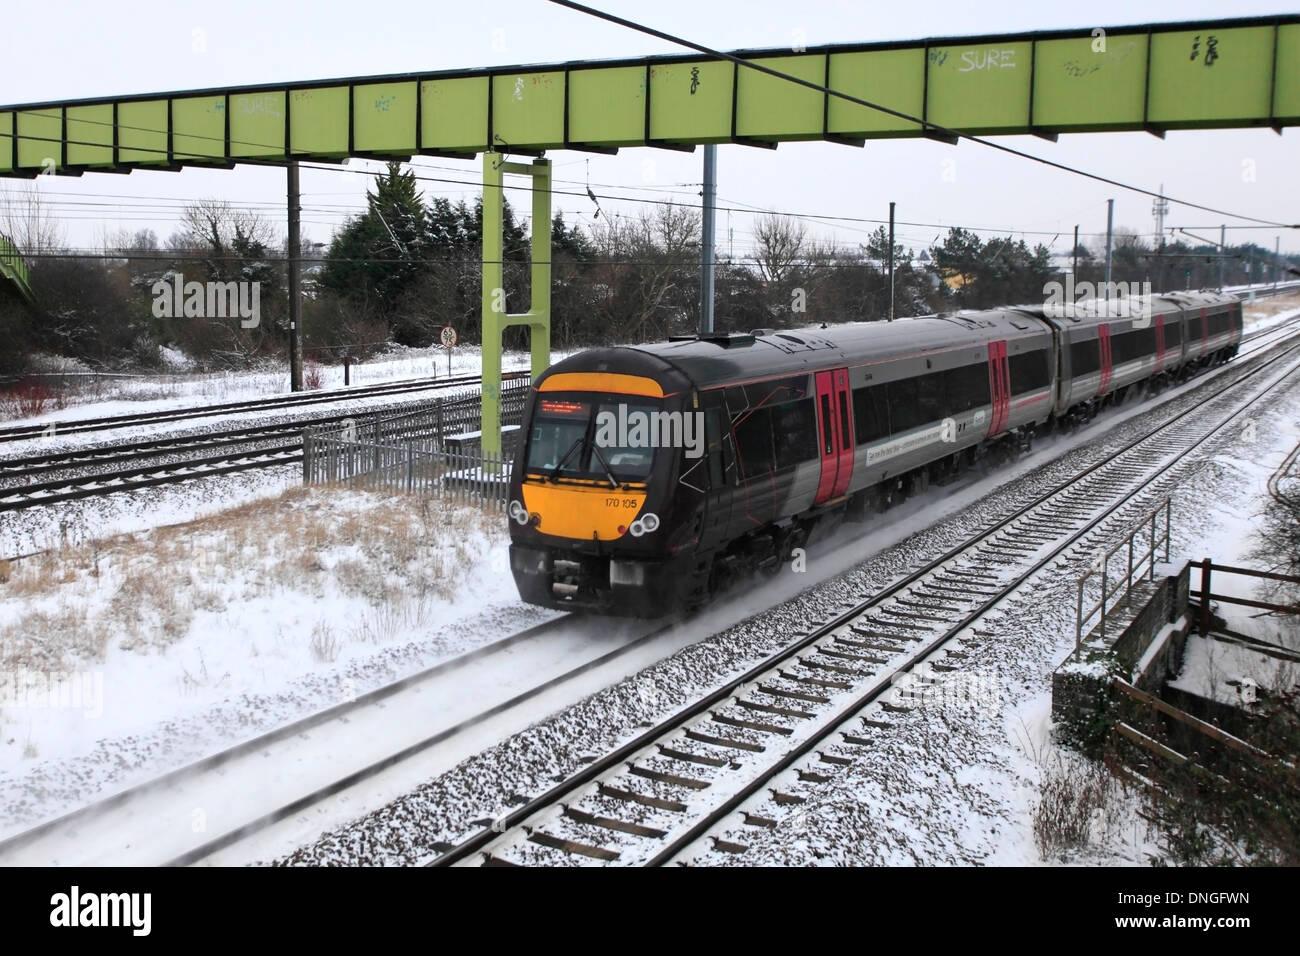 Winter Snow, 170505 County 2 County trains, Turbostar class, High Speed Diesel Train East Coast Main Line Railway Cambridgeshire - Stock Image